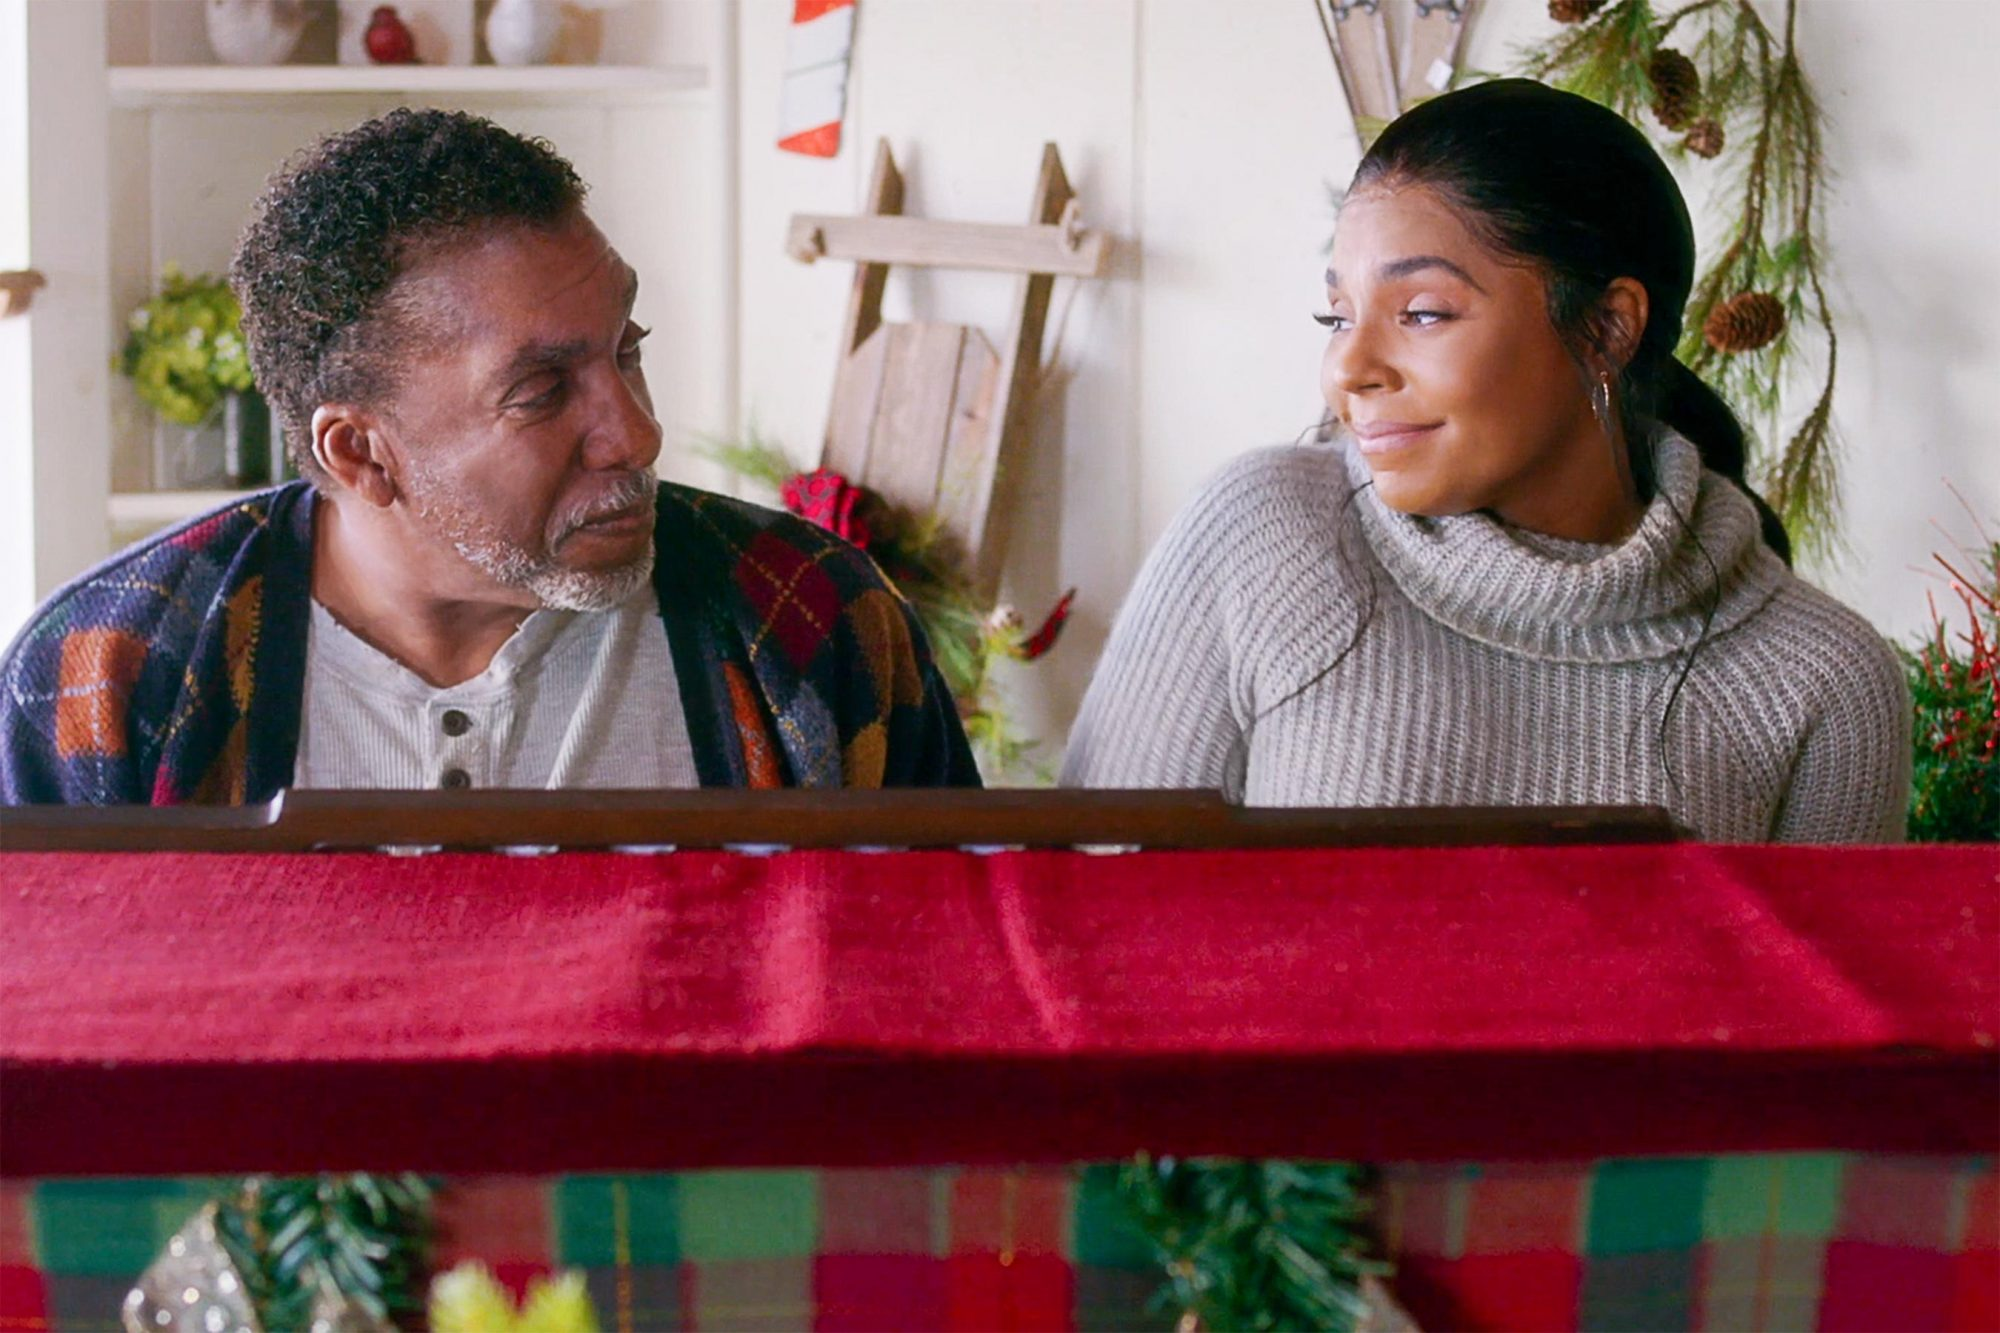 A Christmas Winter SongCourtesy of Marvista Entertainment